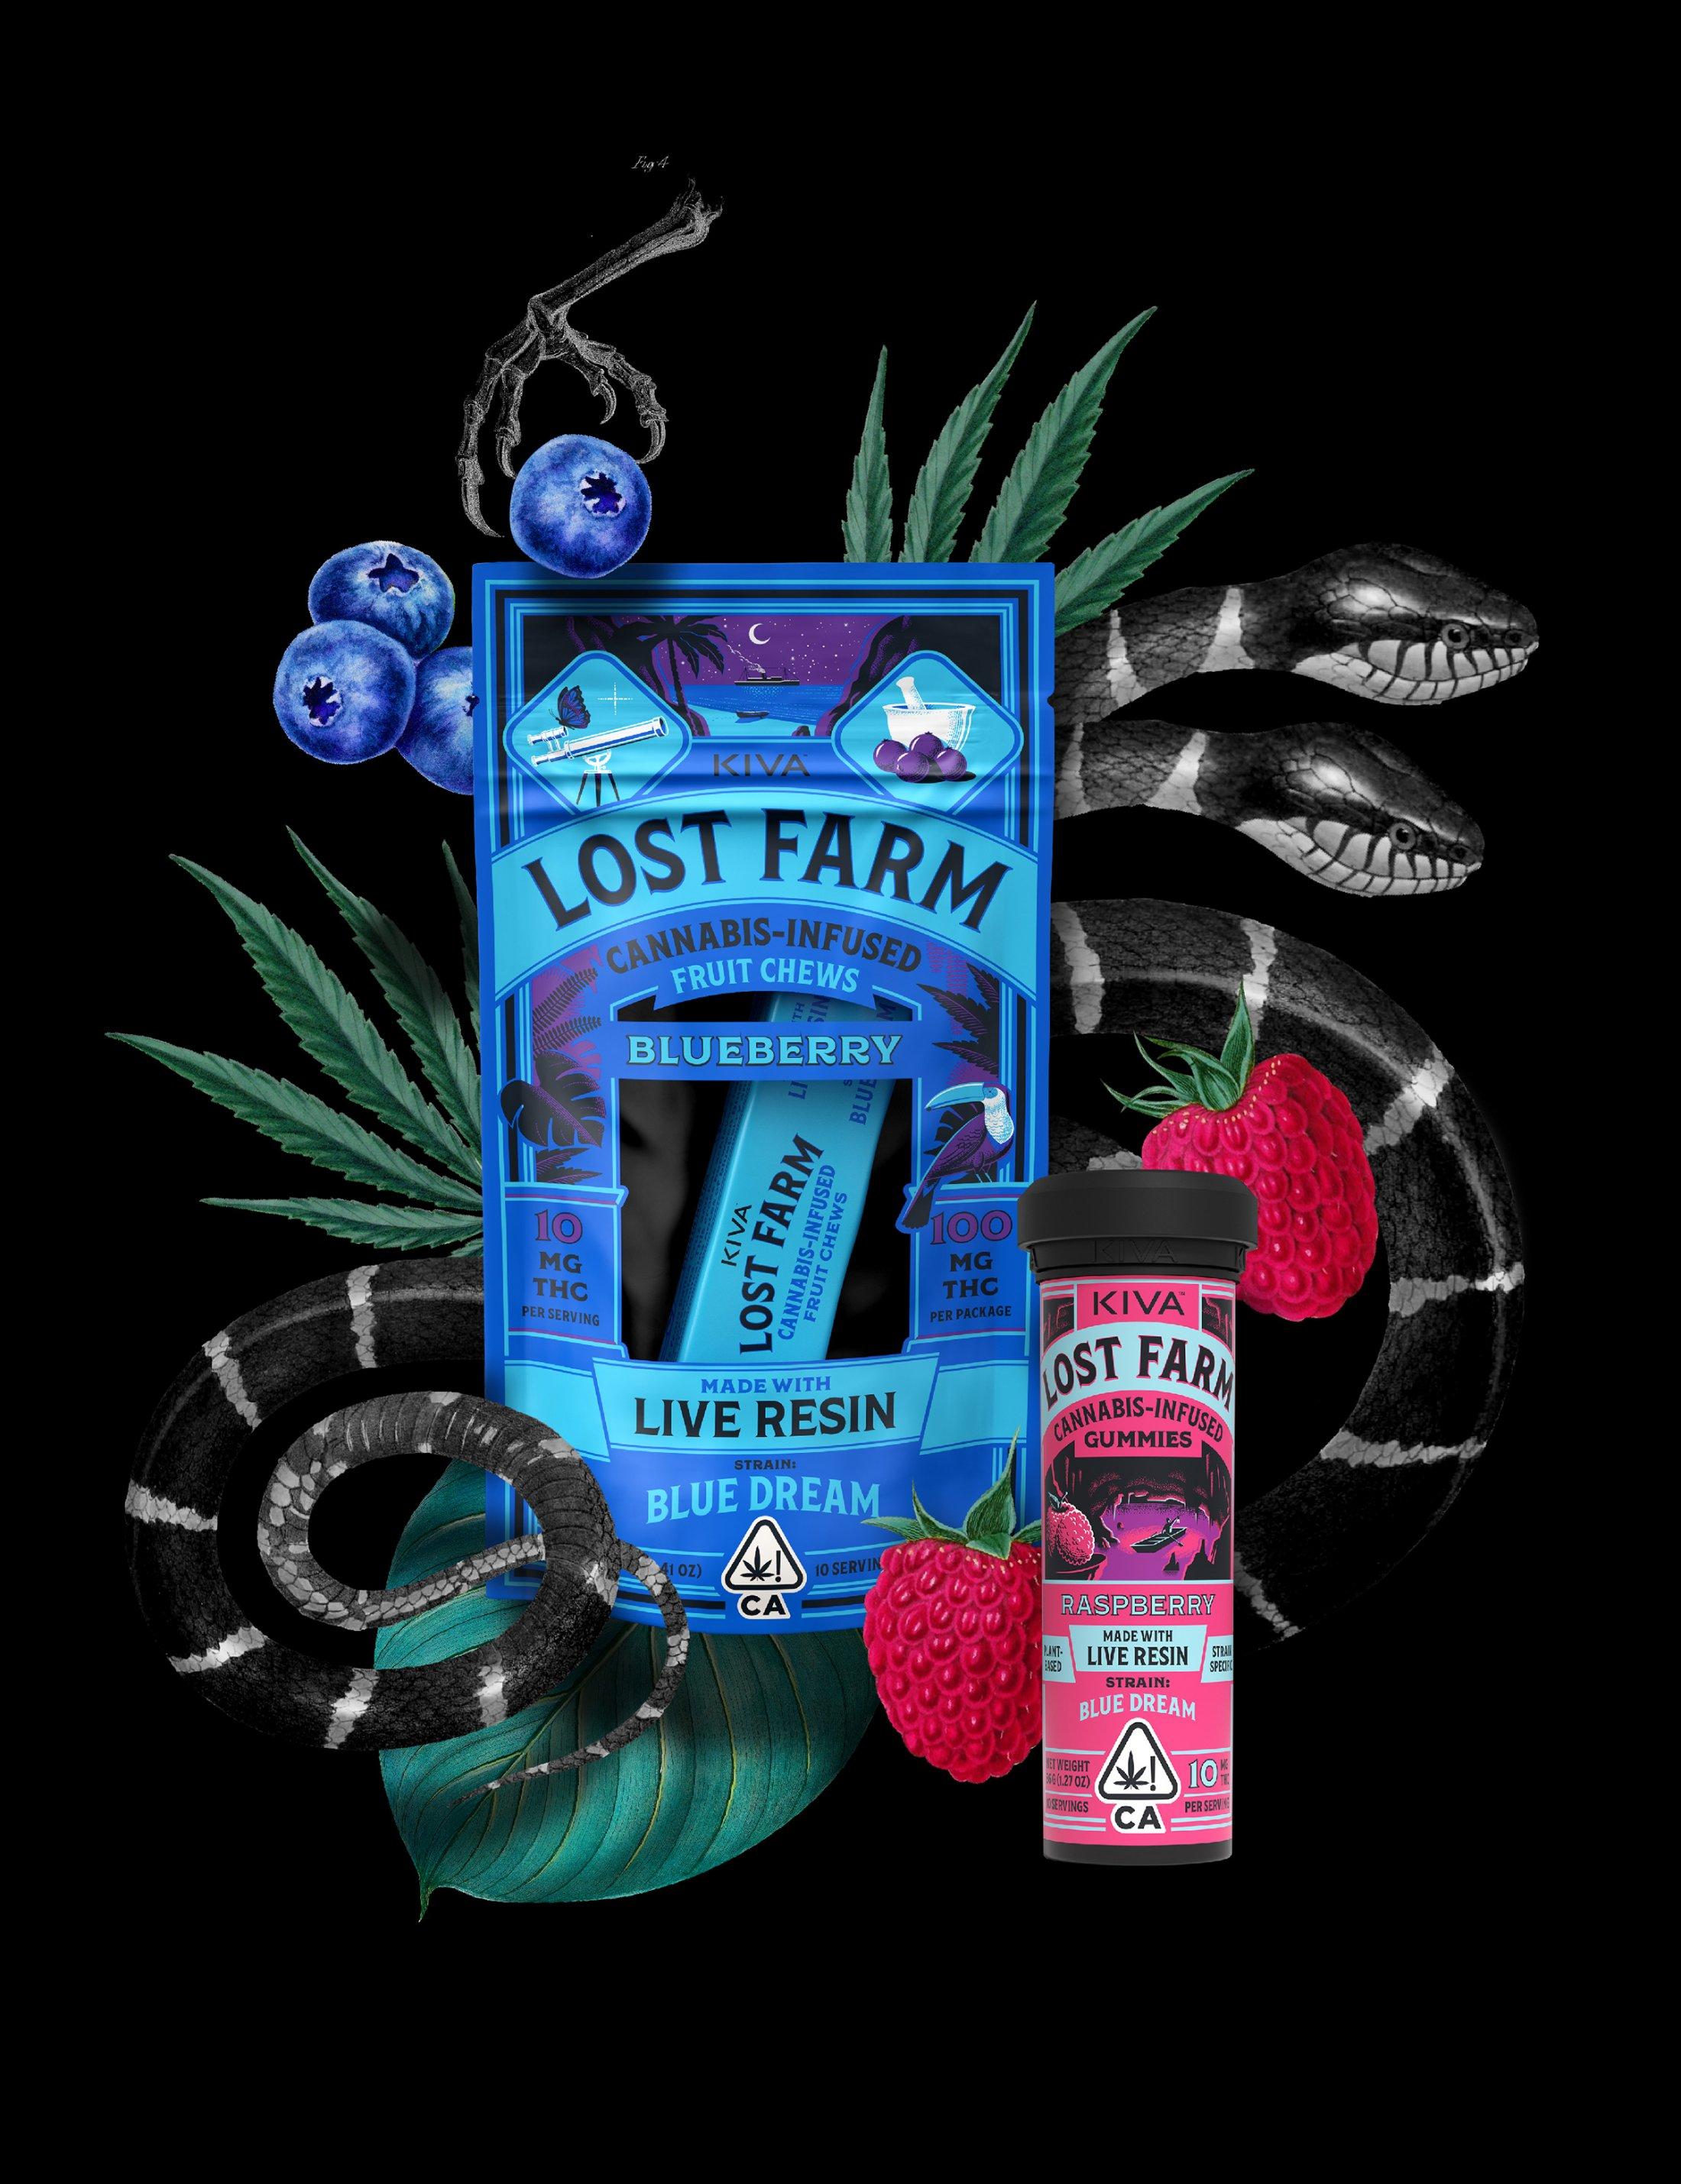 Lost Farm: Novices Need Not Apply